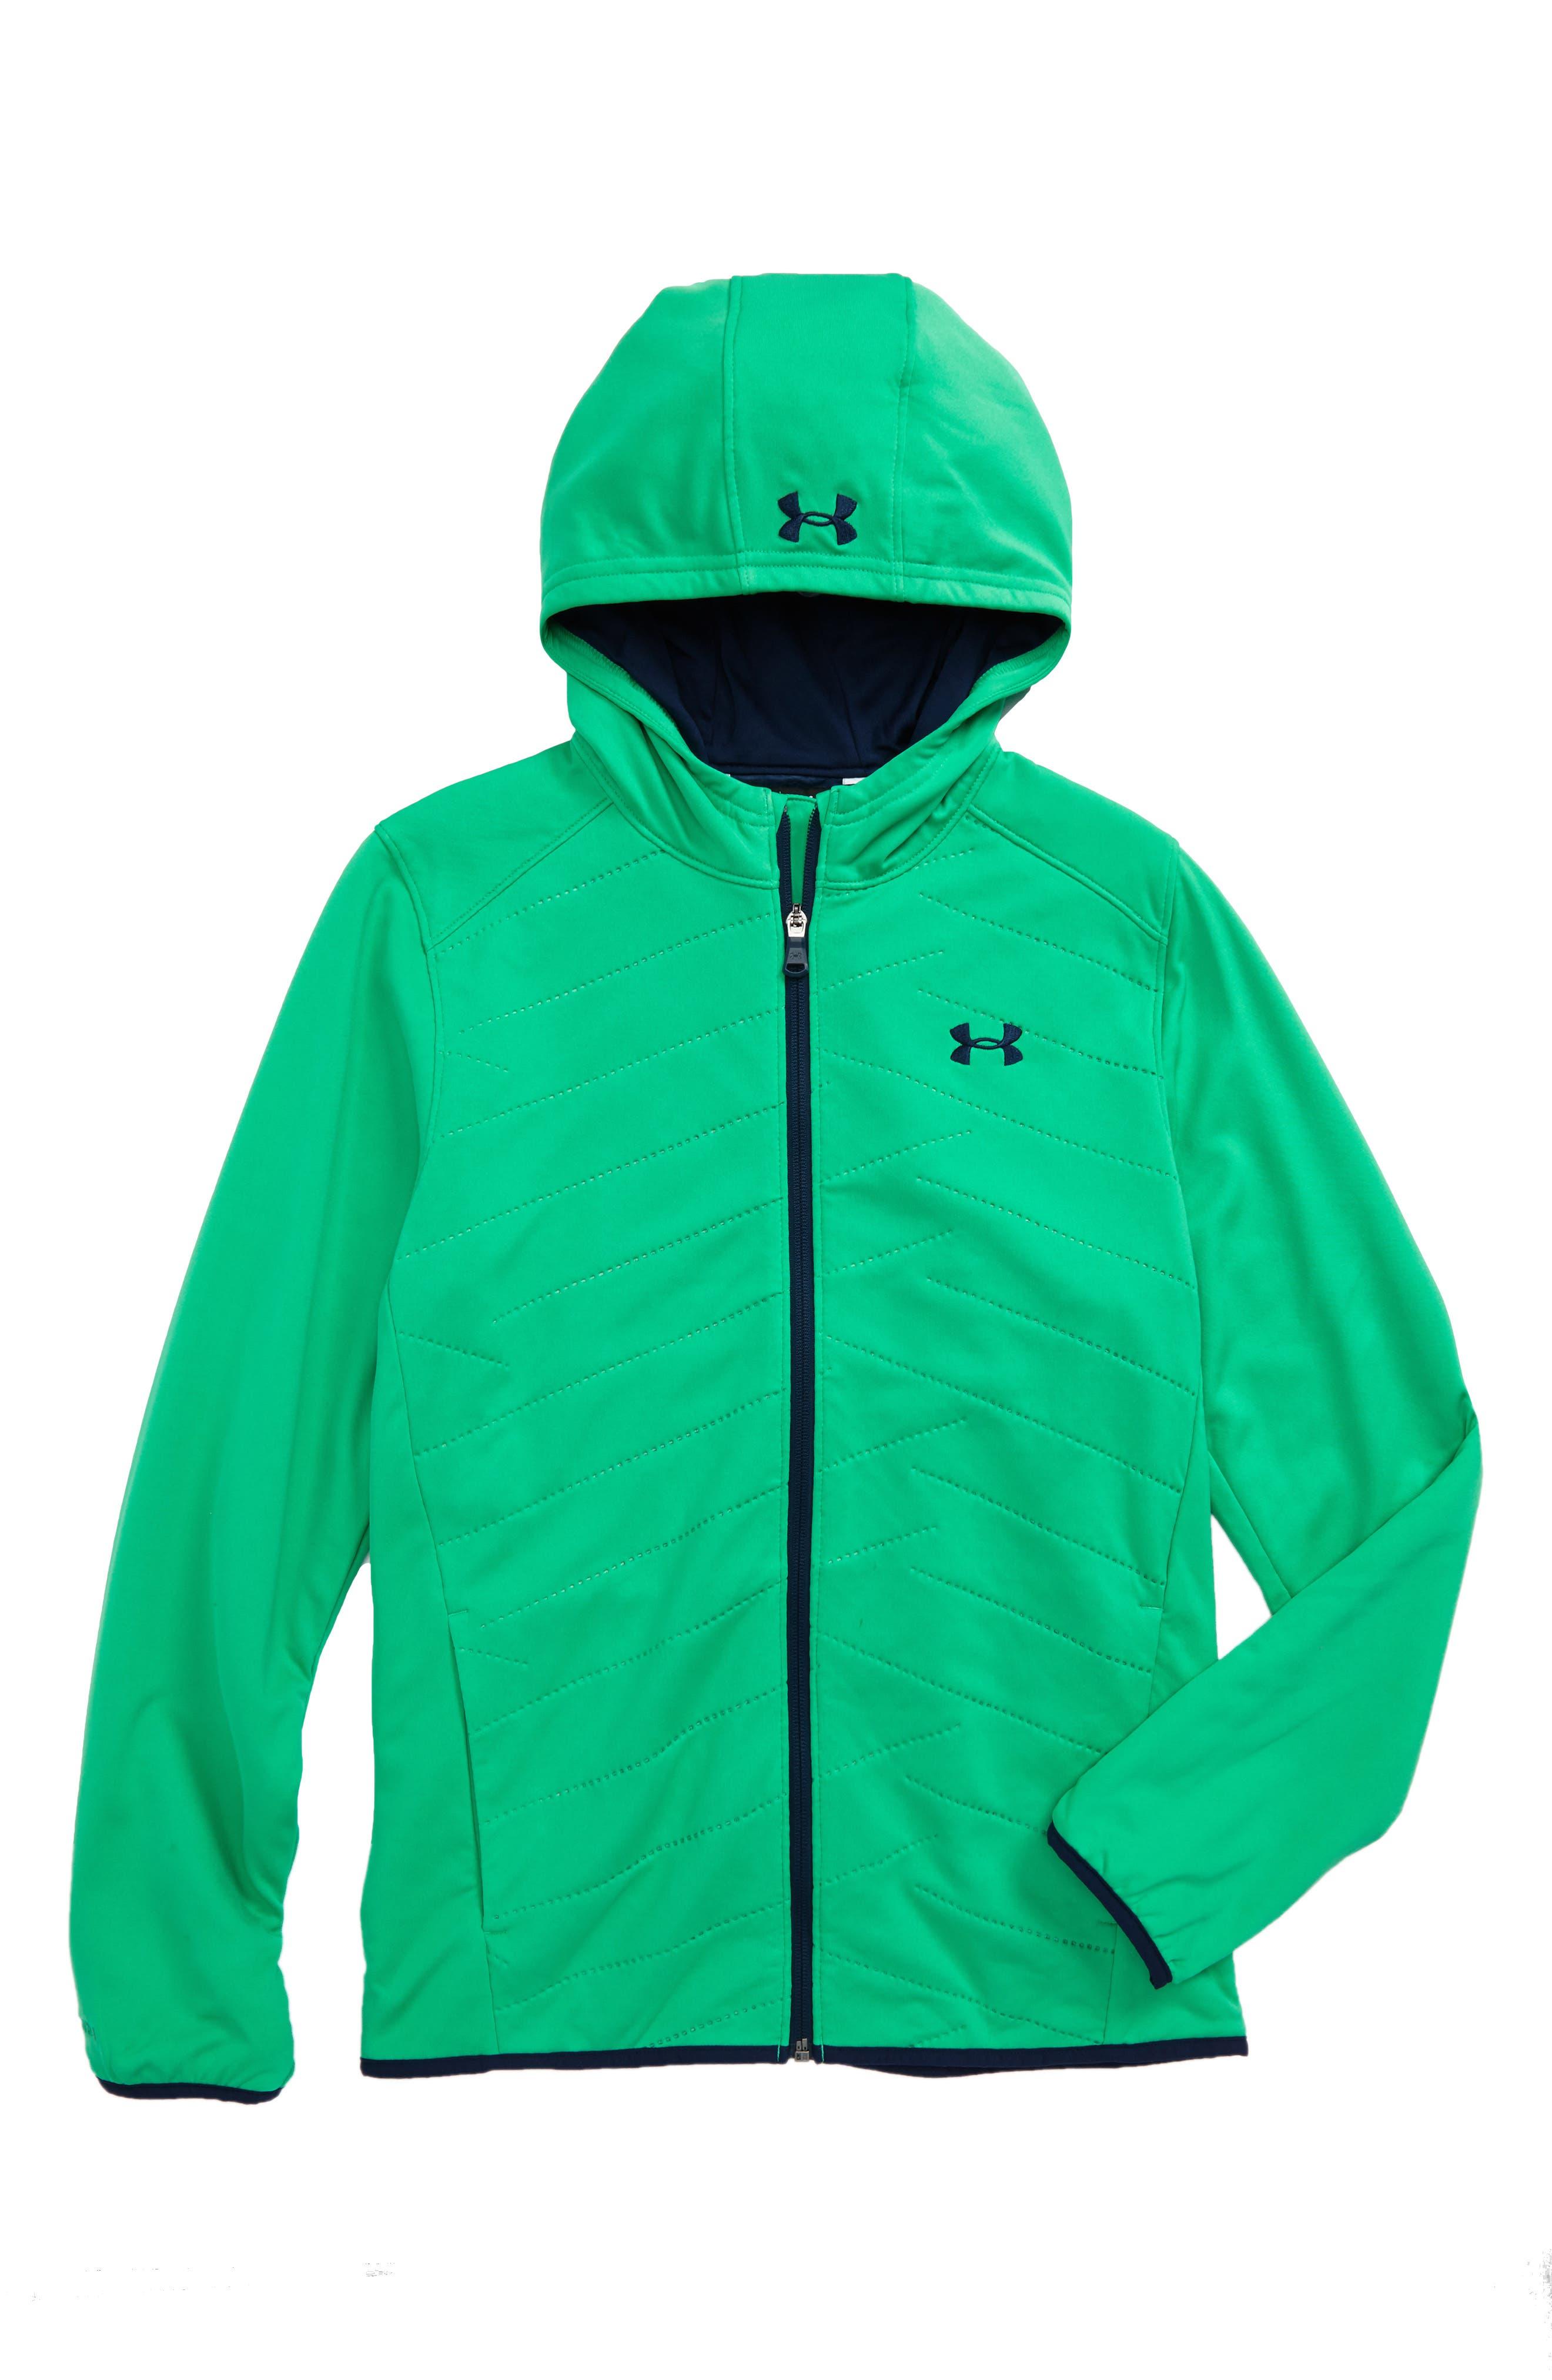 ColdGear<sup>®</sup> Reactor Hybrid Hooded Jacket,                         Main,                         color, Jade/ Academy